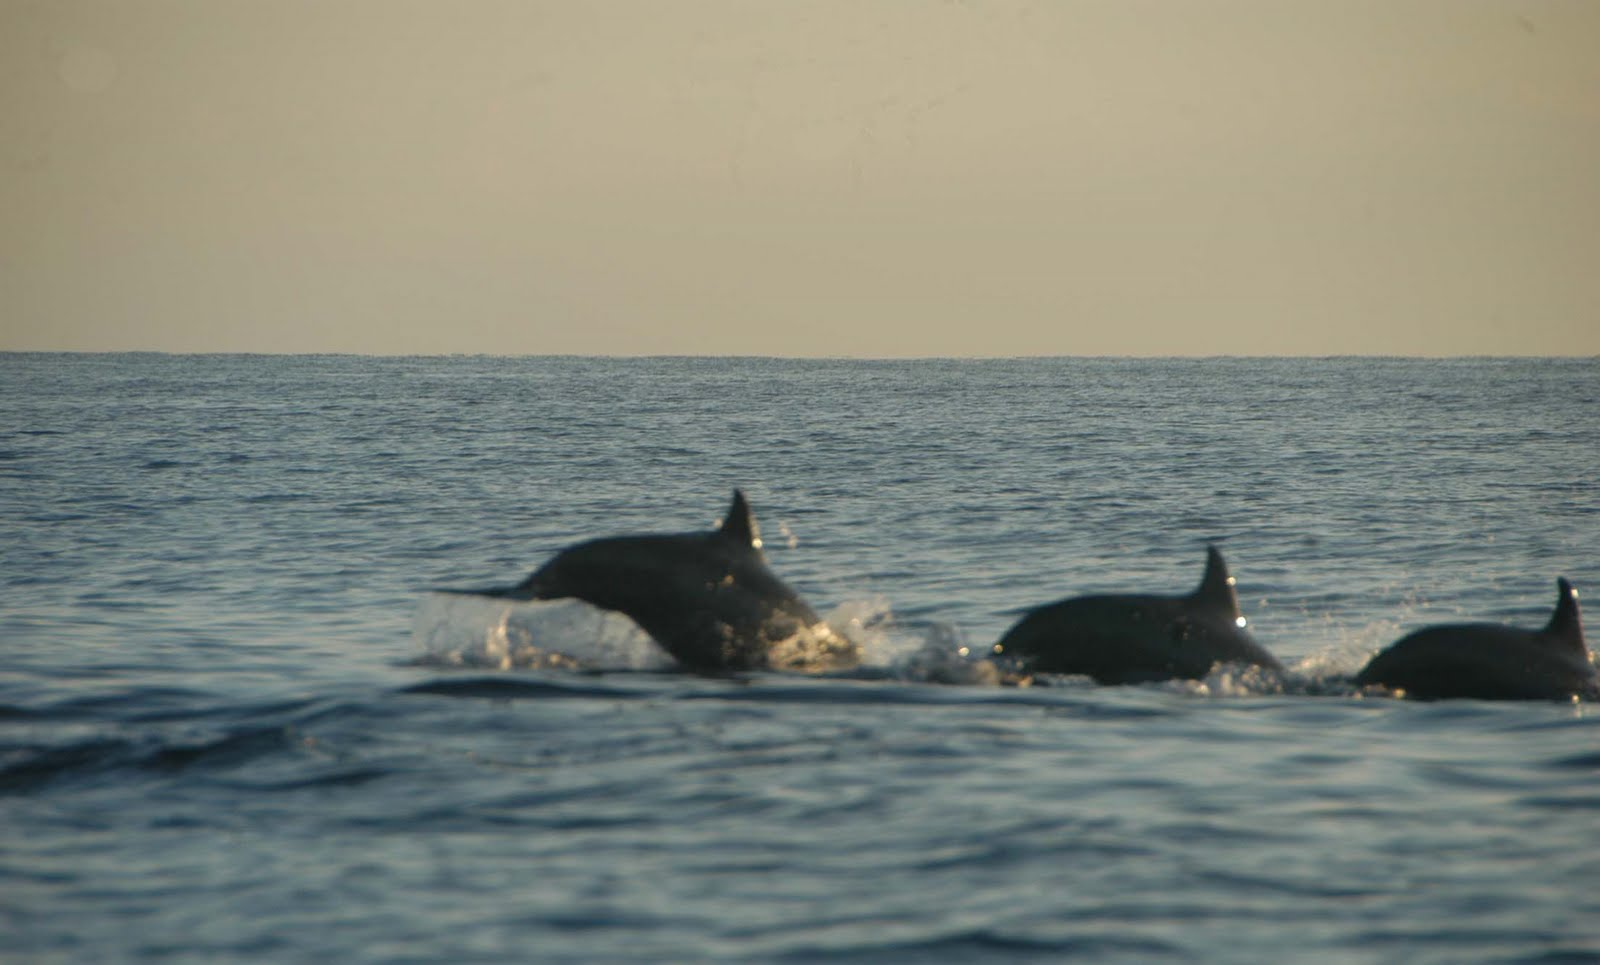 Dolphin In Lovina Beach Wallpaper 8655 Wallpaper ForWallpaperscom 1600x965